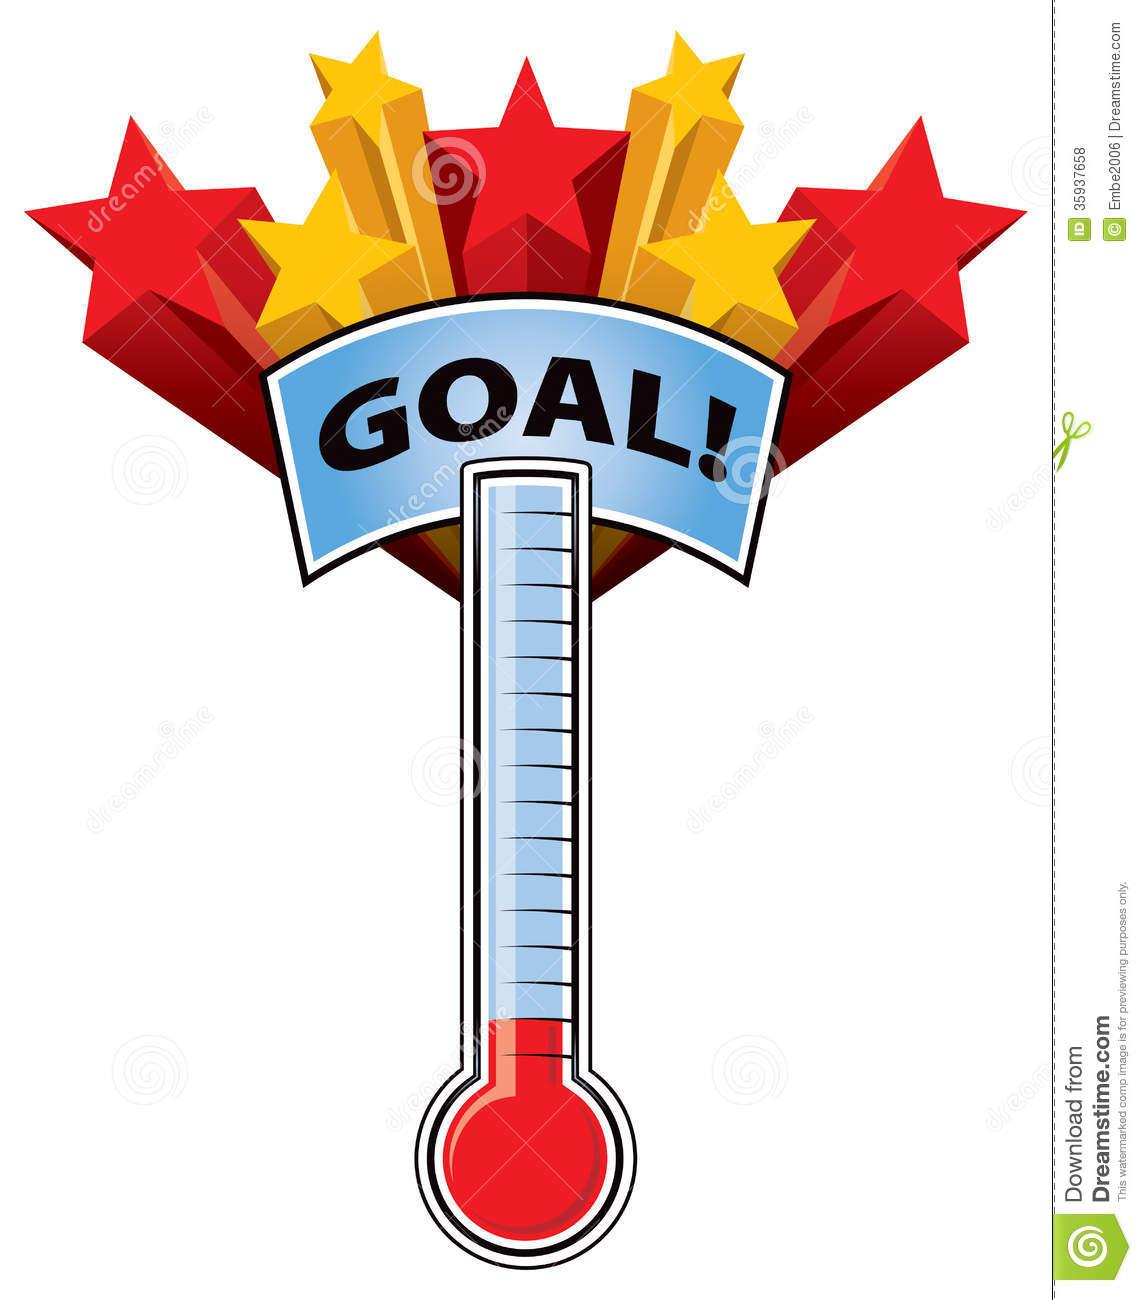 Fundraising clipart. Fundraiser goal